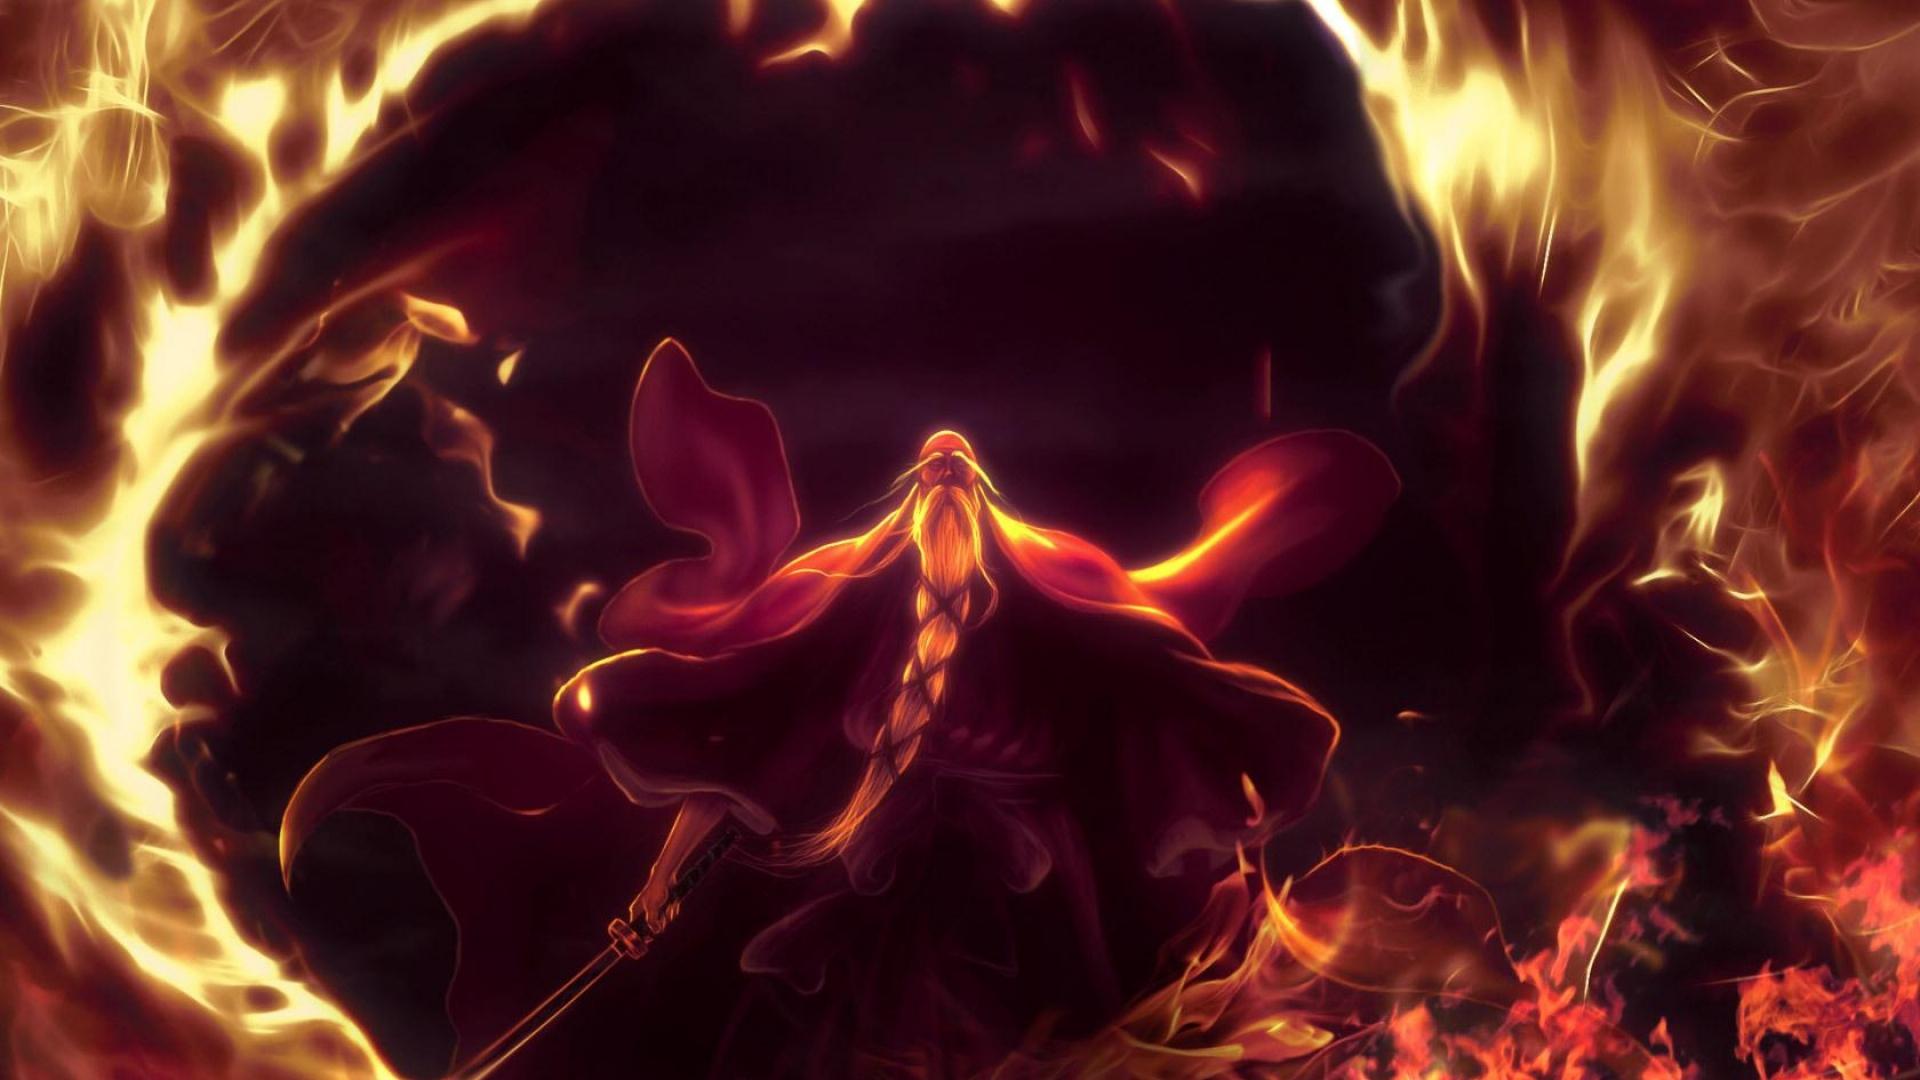 download wallpaper 1920x1080 fire, flame, sword, old man, magician